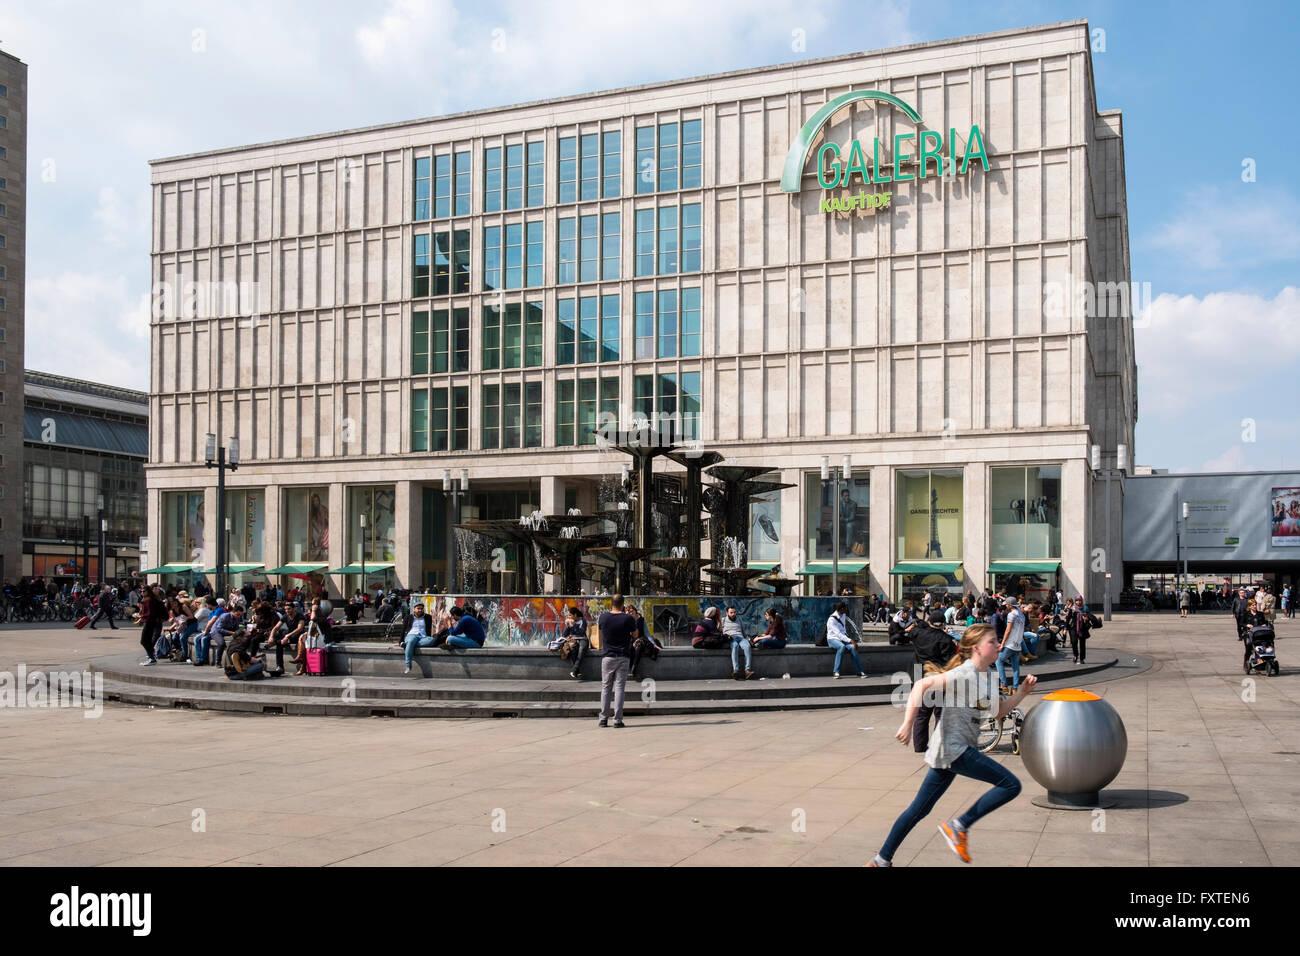 Exterior view of Galleria Kaufhof department store in Alexanderplatz, Mitte Berlin Germany - Stock Image